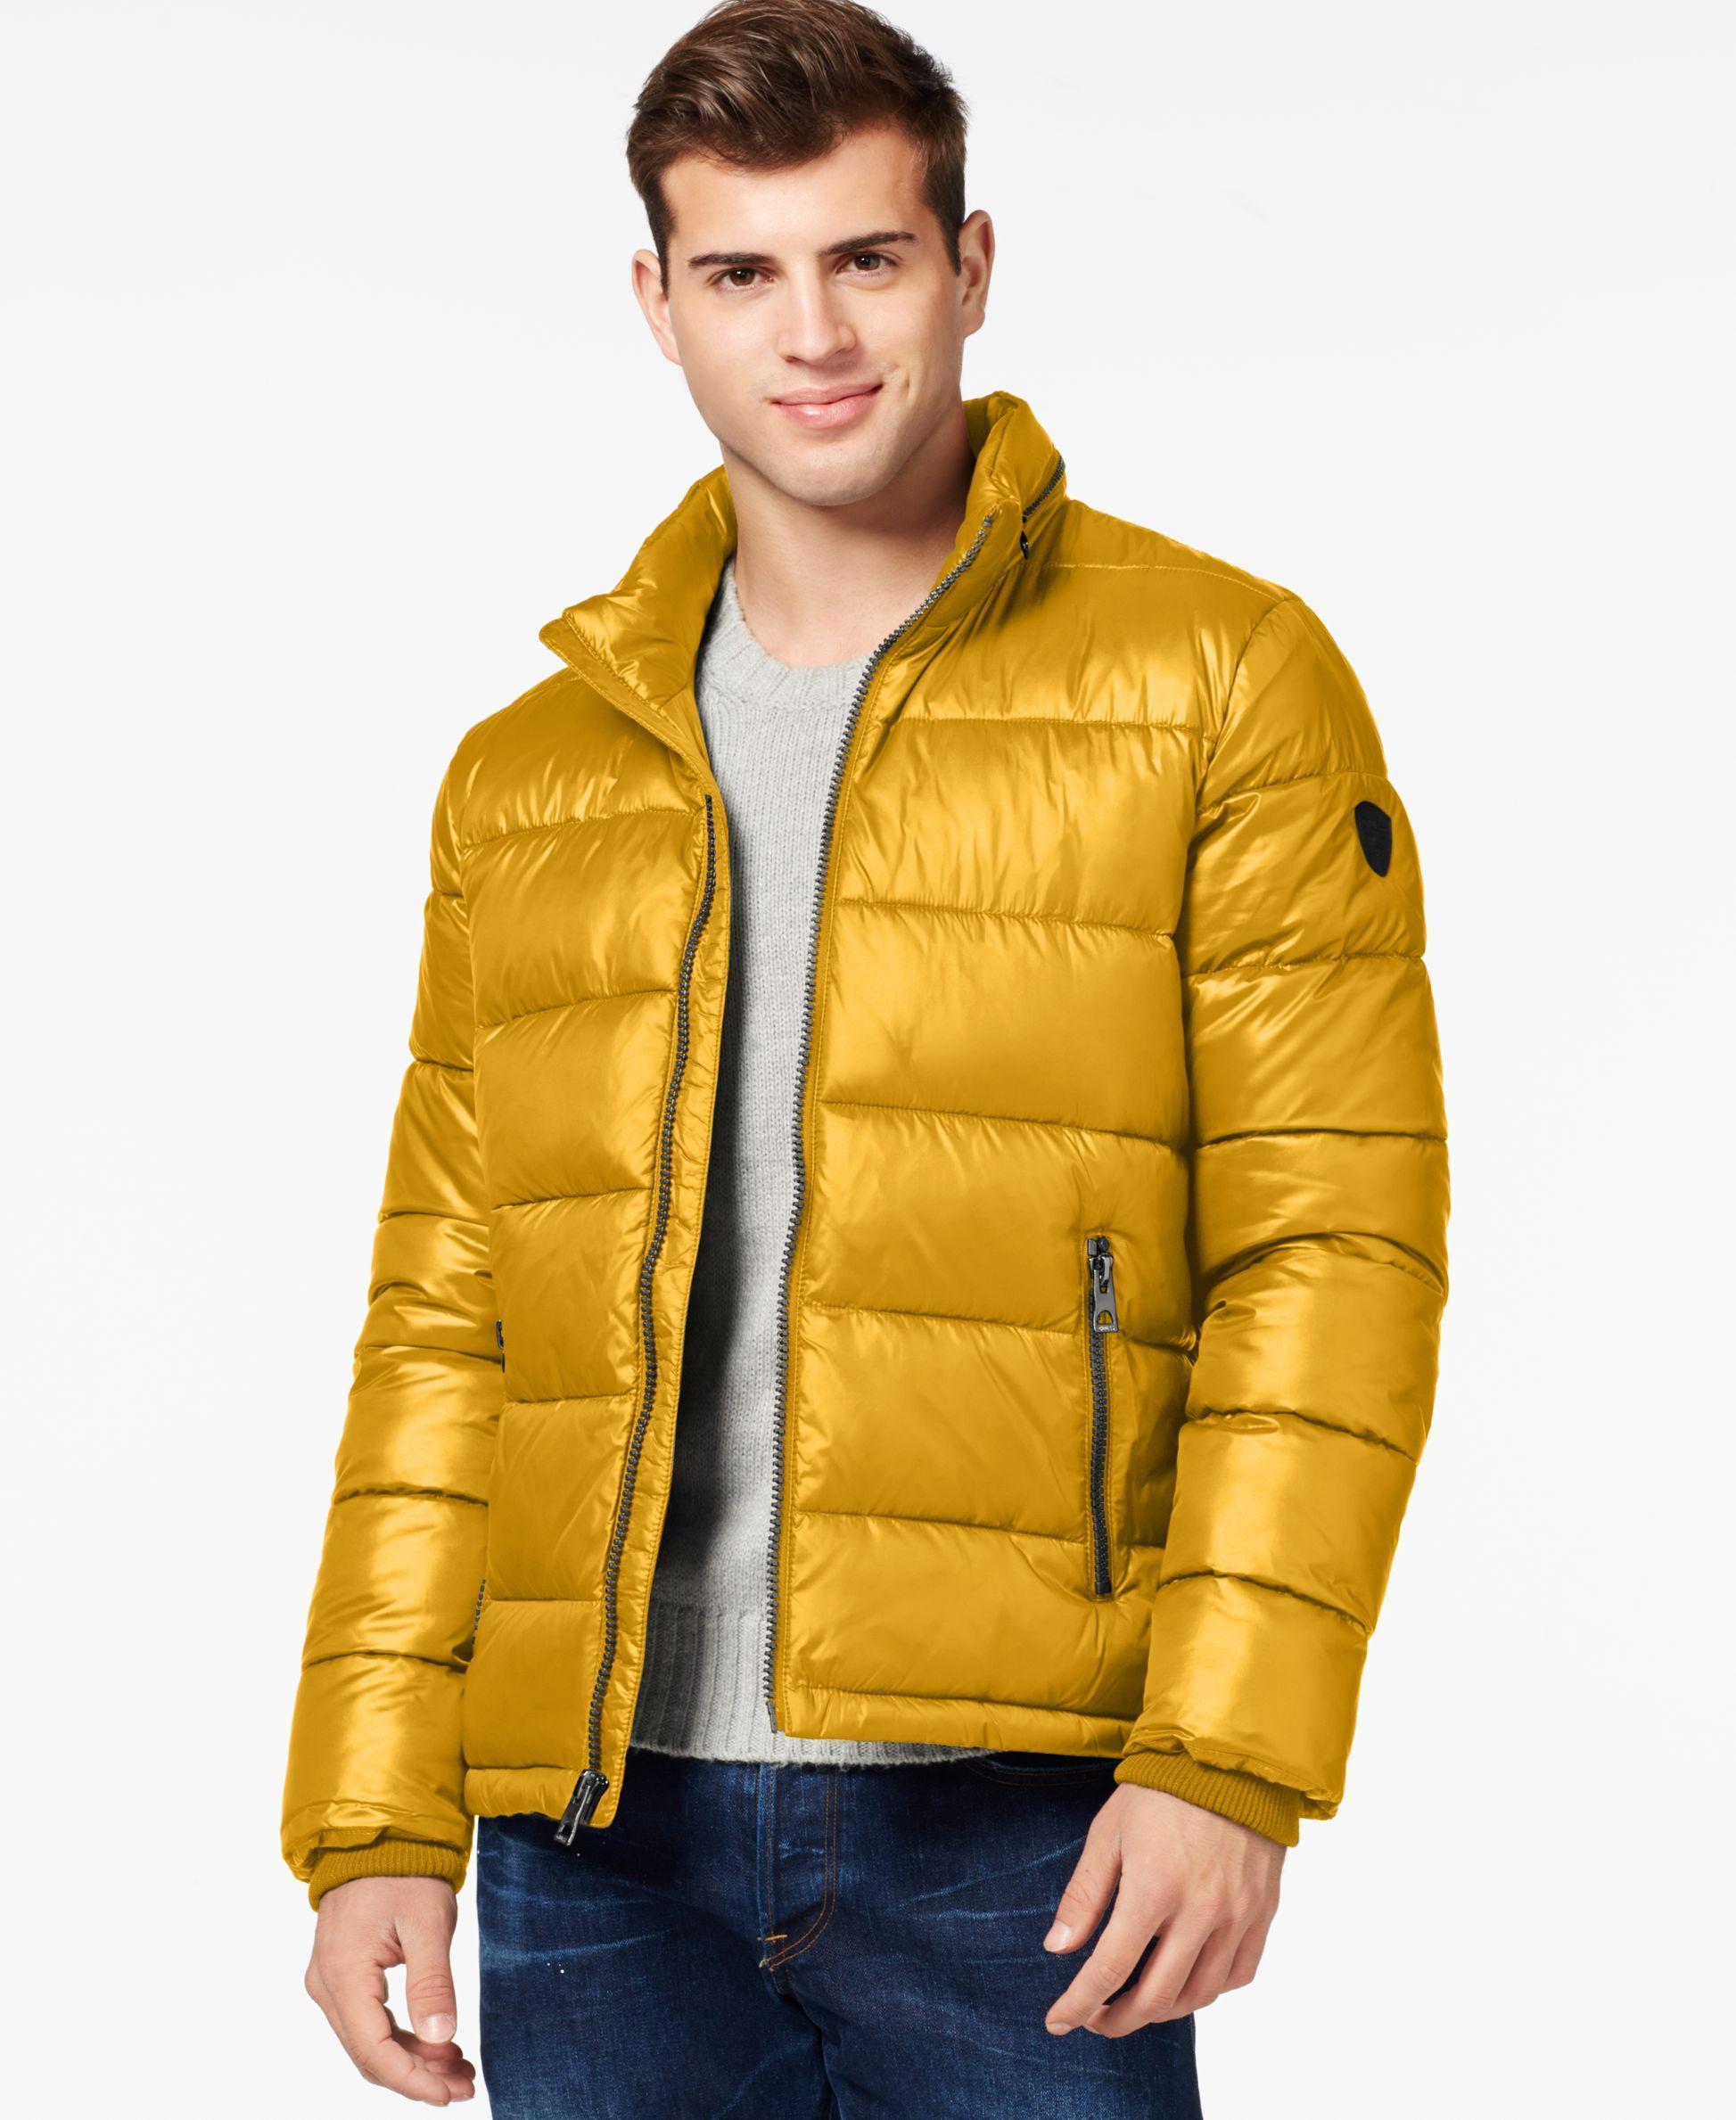 Guess Basic Puffer Jacket Coats Jackets Men Macy S Winter Jacket Men Winter Jackets Mens Jackets [ 2378 x 1947 Pixel ]